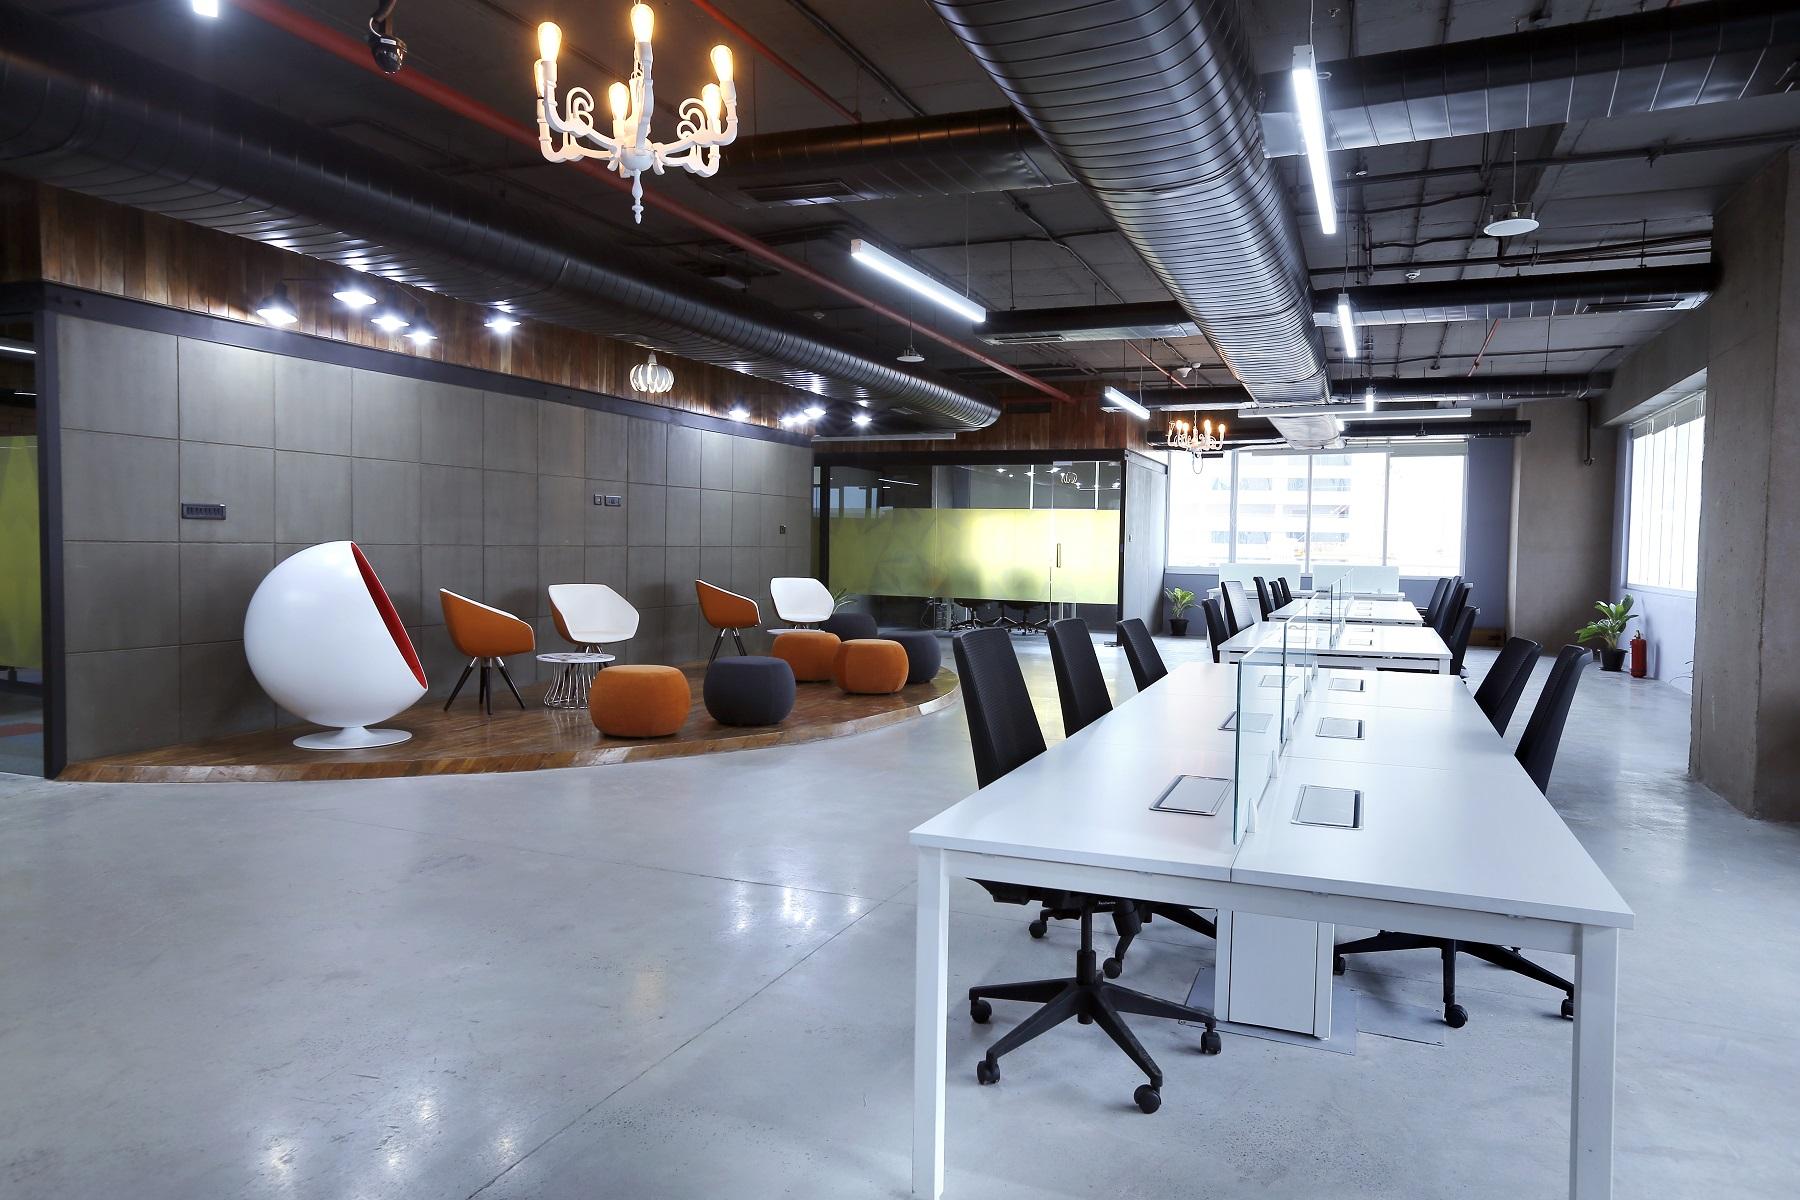 Kapil towers hyderabad workspace designers for Interior design hyderabad cost